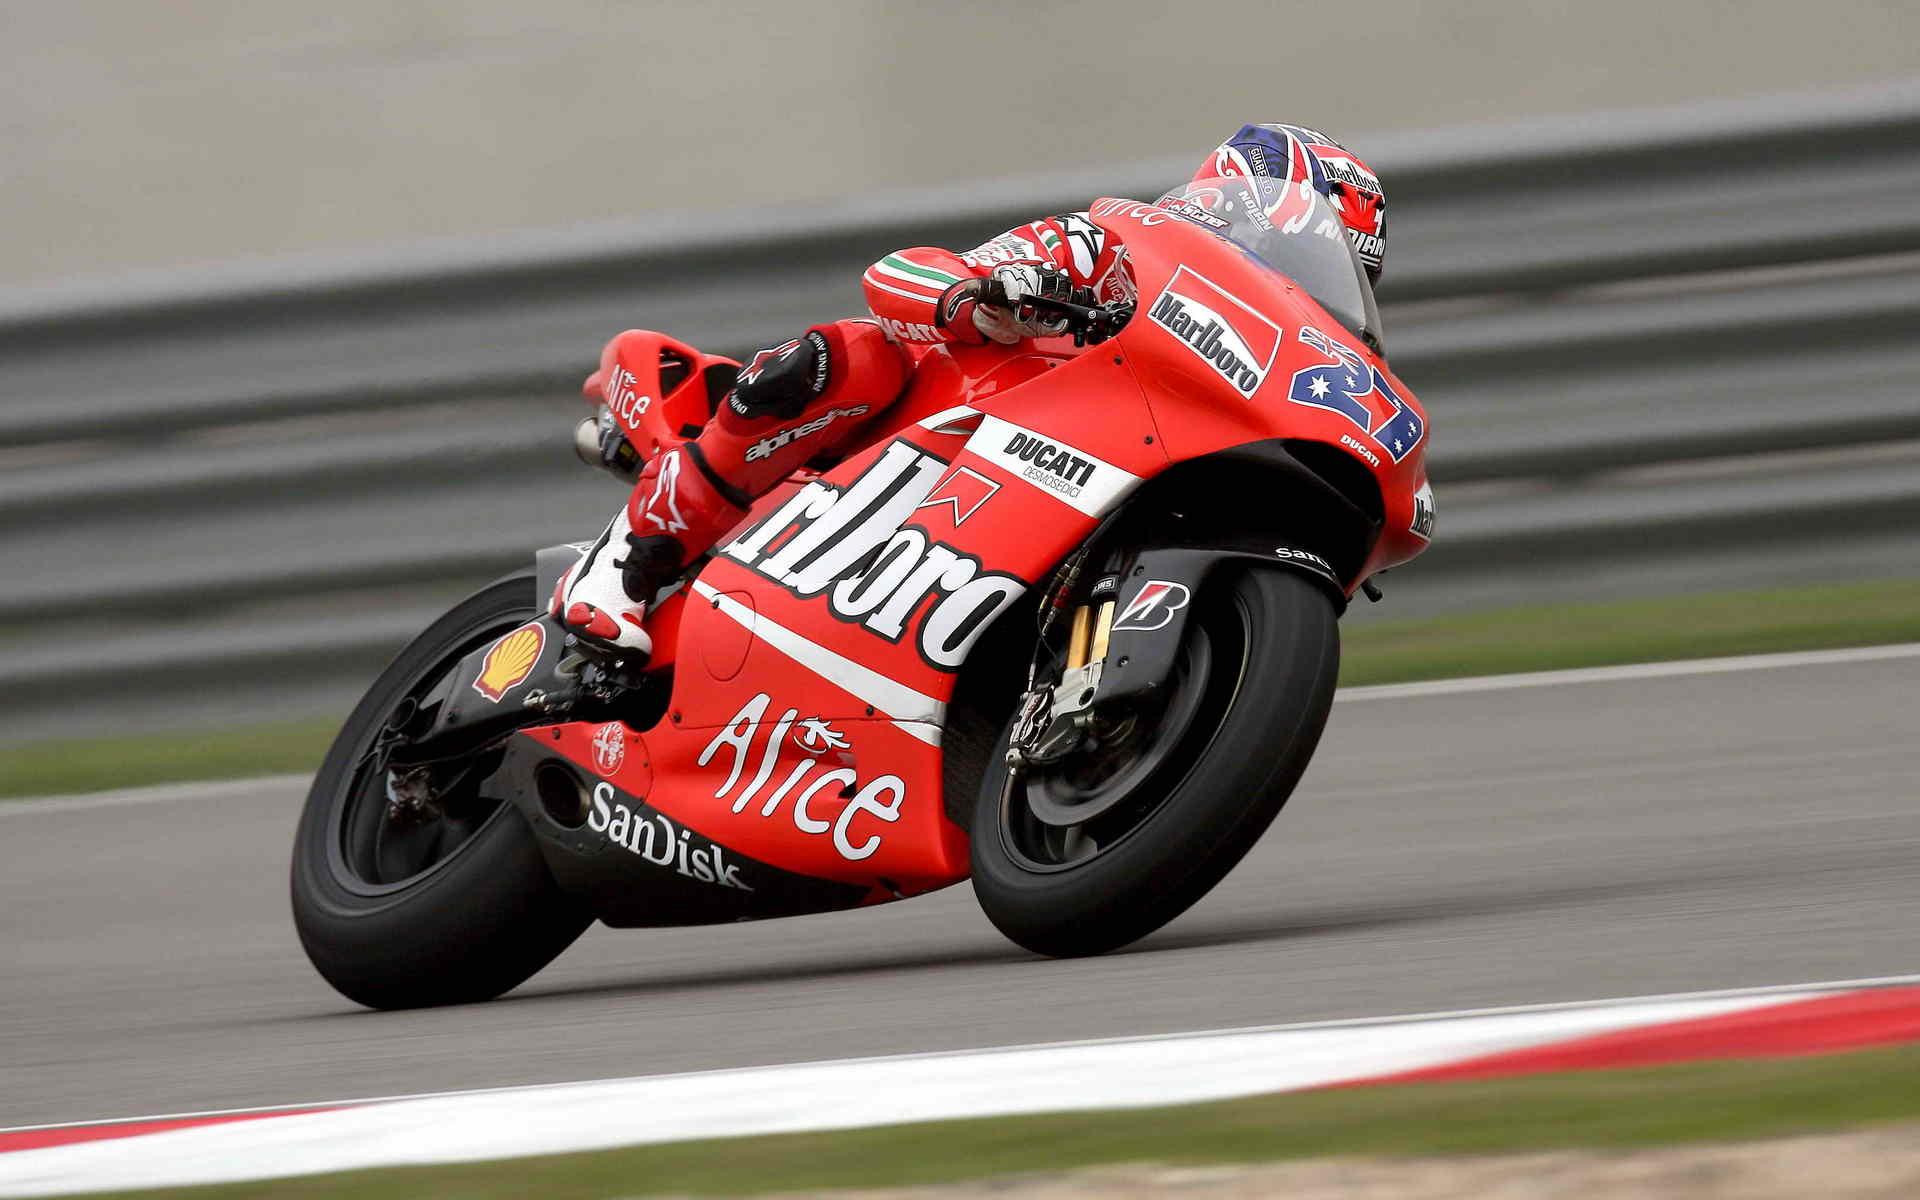 Ducati - MotoGP - Casey Stoner